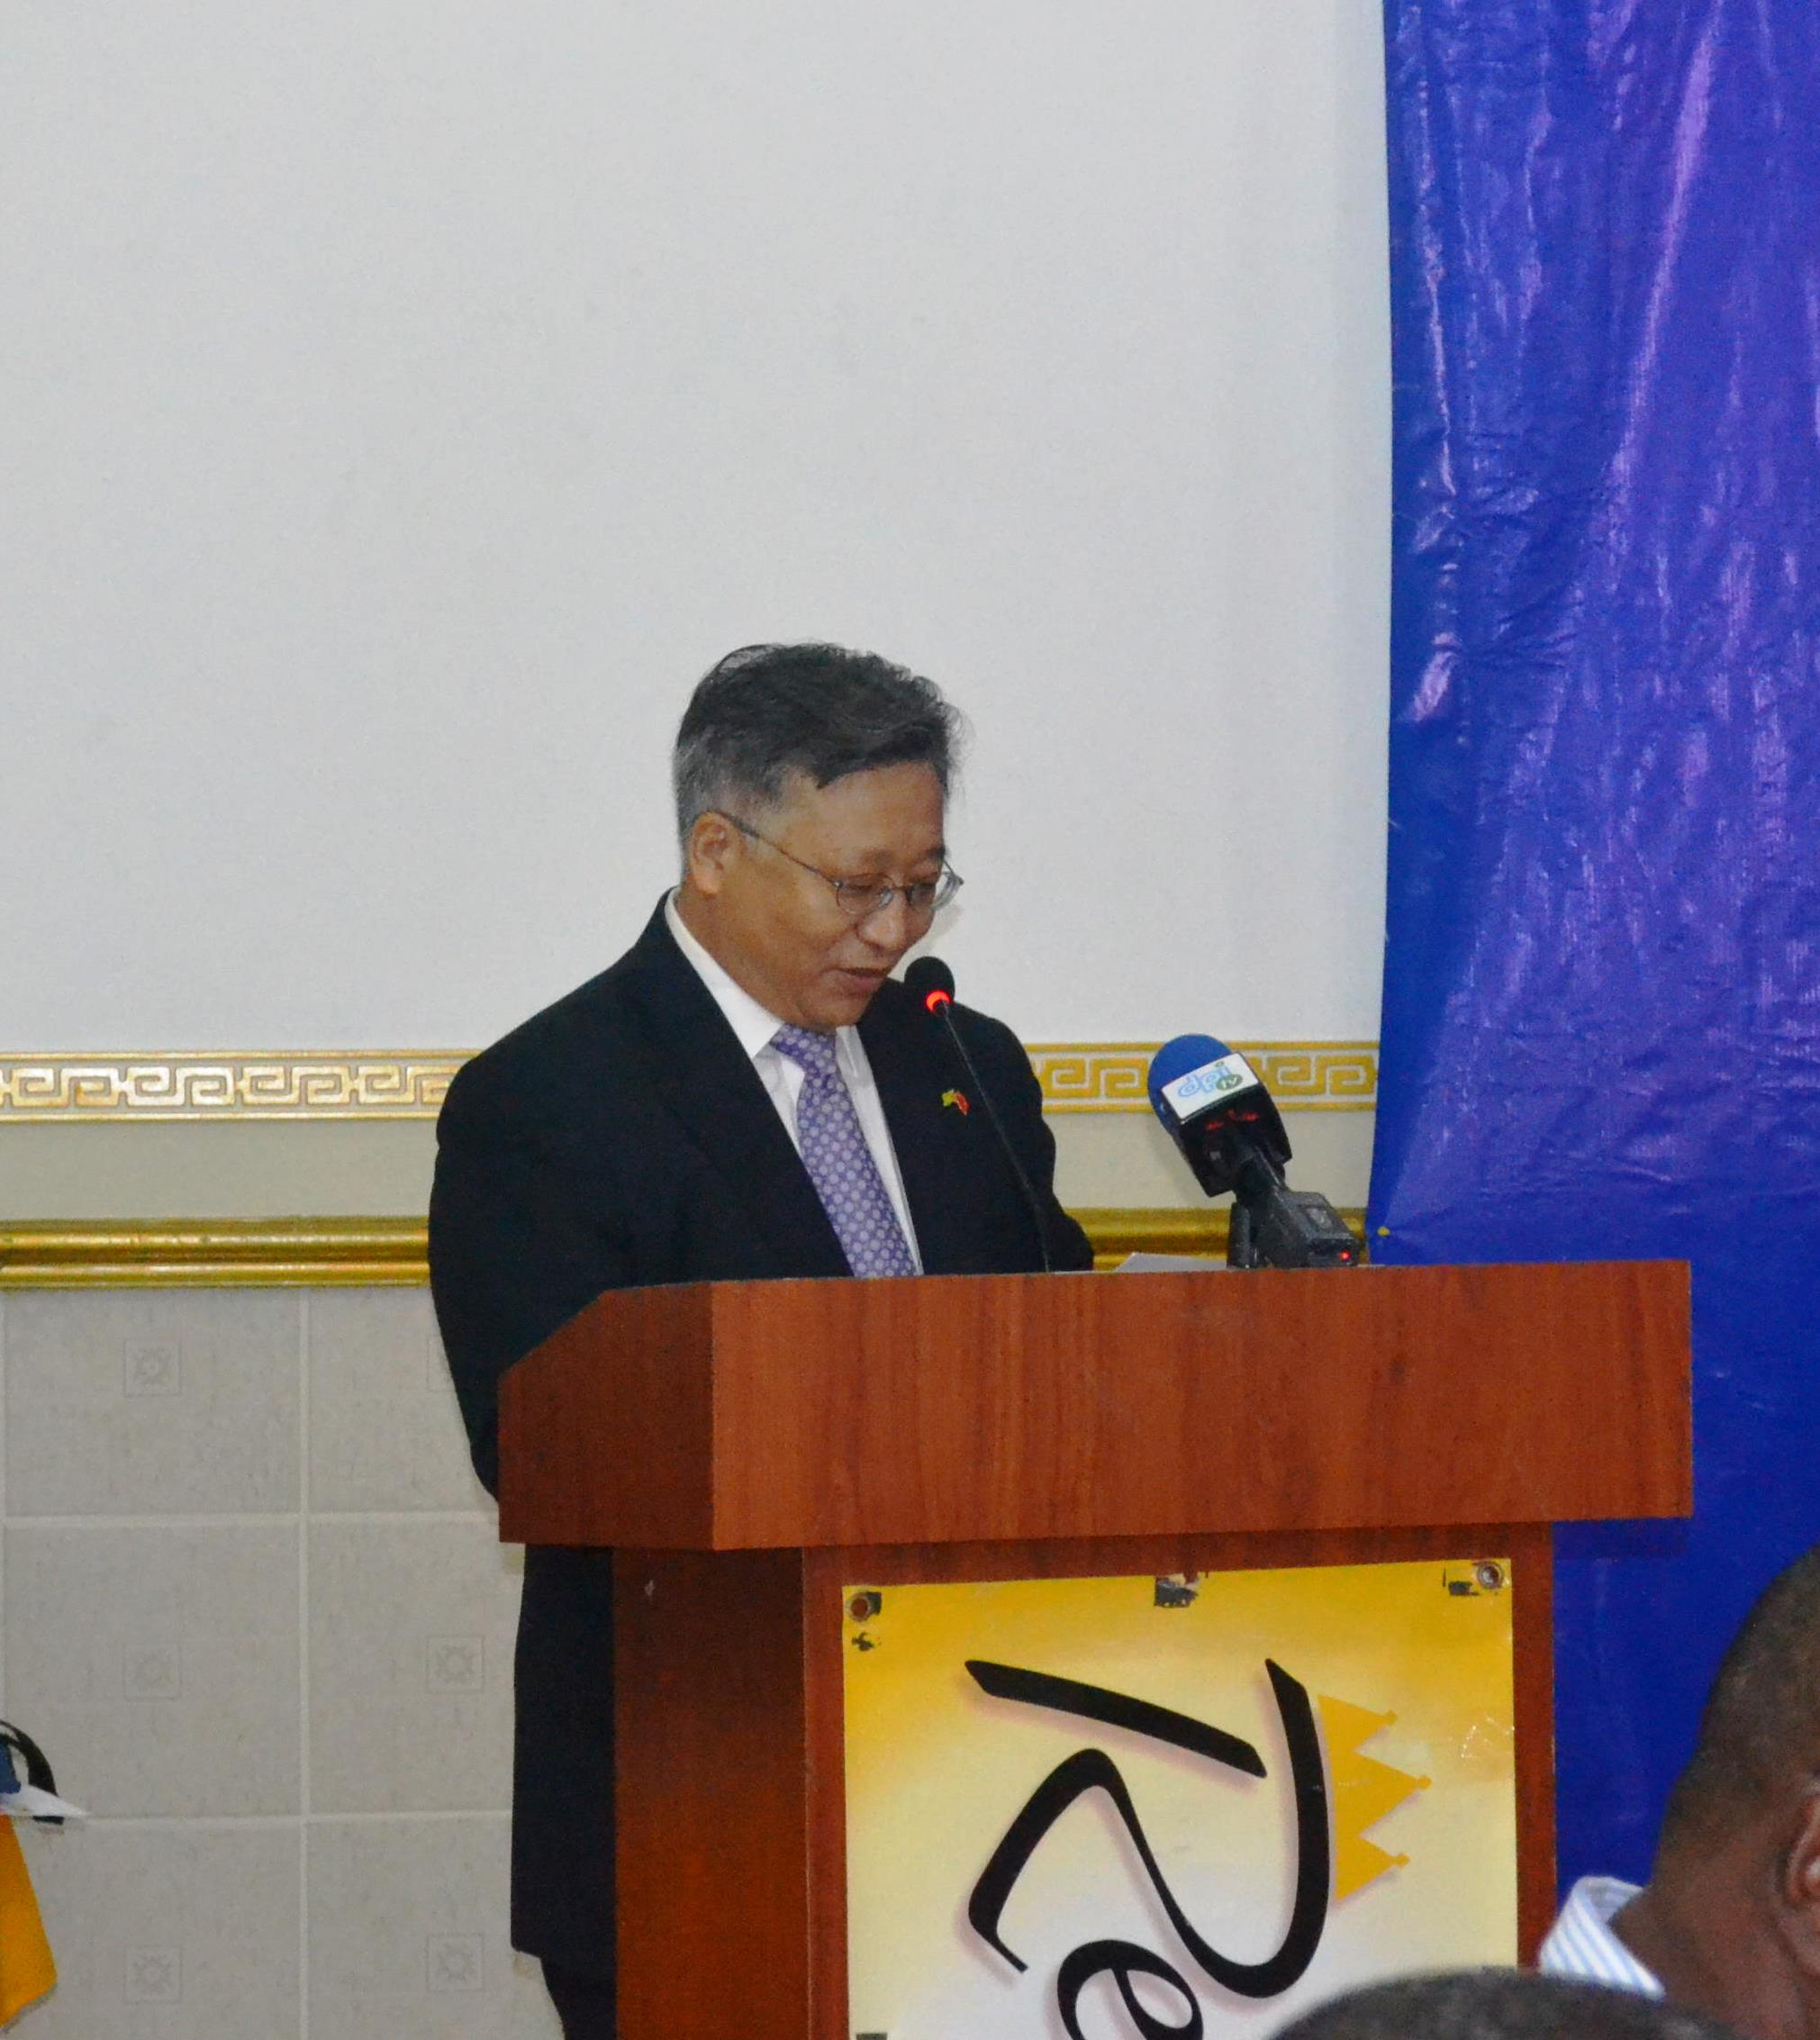 Ambassador of Chinese Embassy in Guyana, H.E. Cui Jianchun